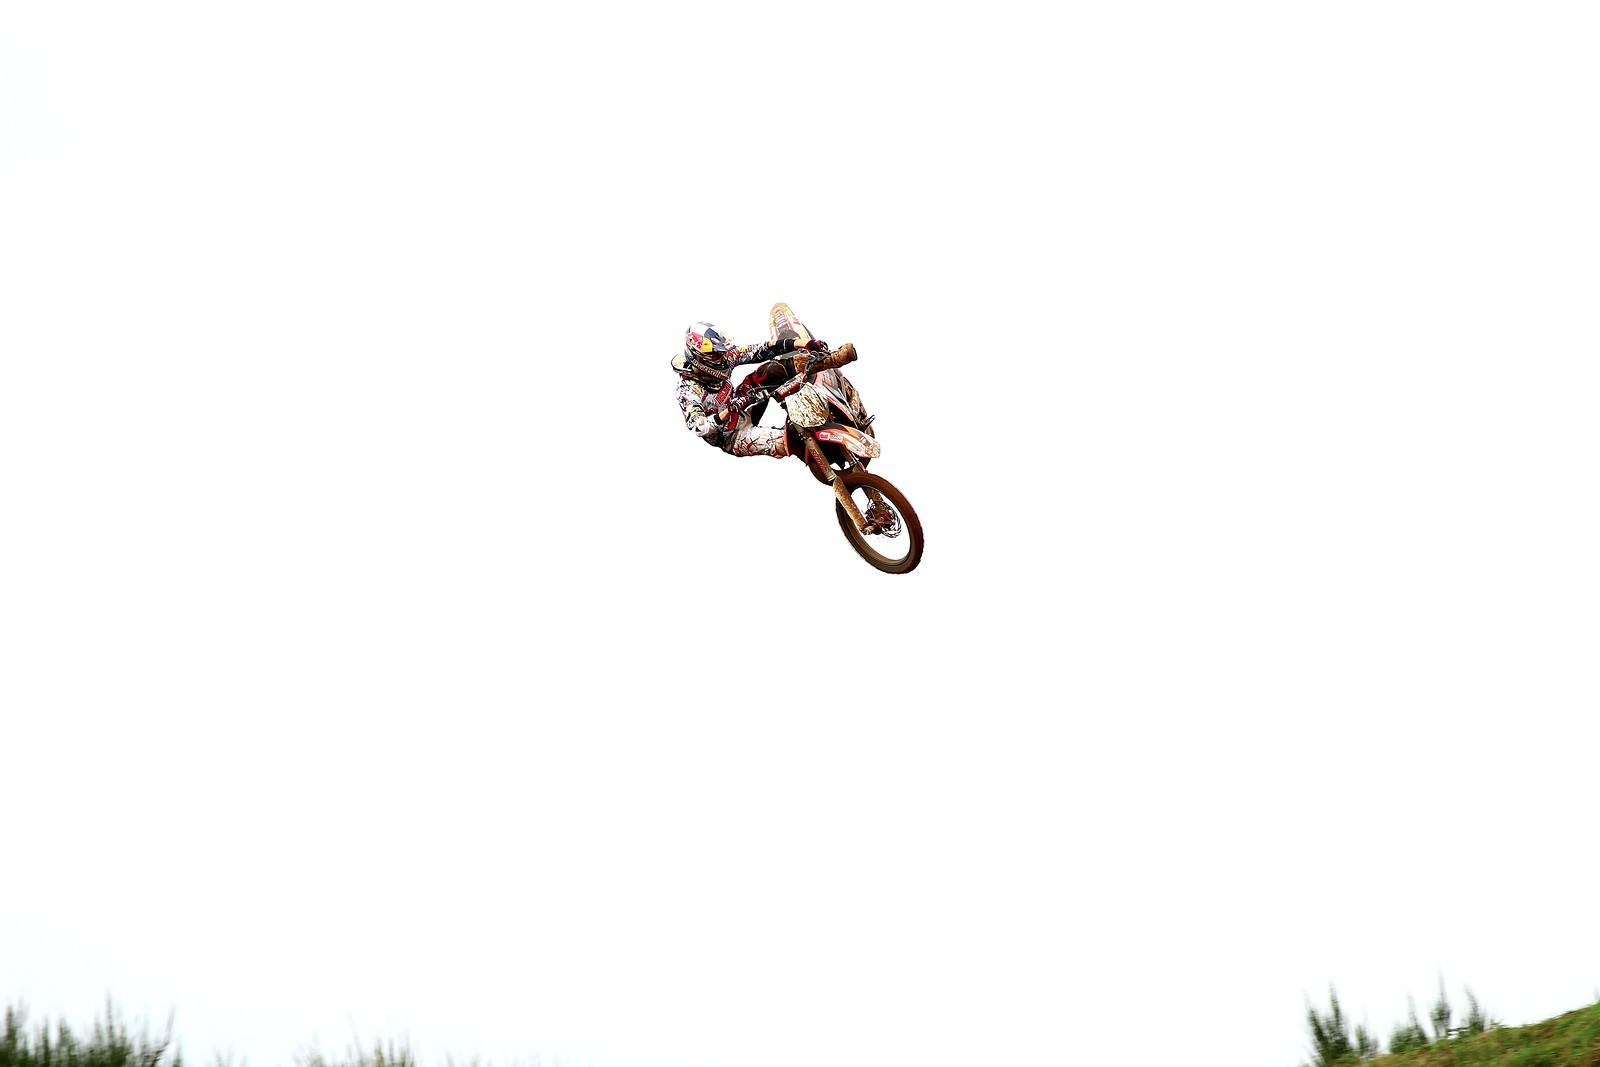 Jake Nicholls - timlake - Motocross Pictures - Vital MX